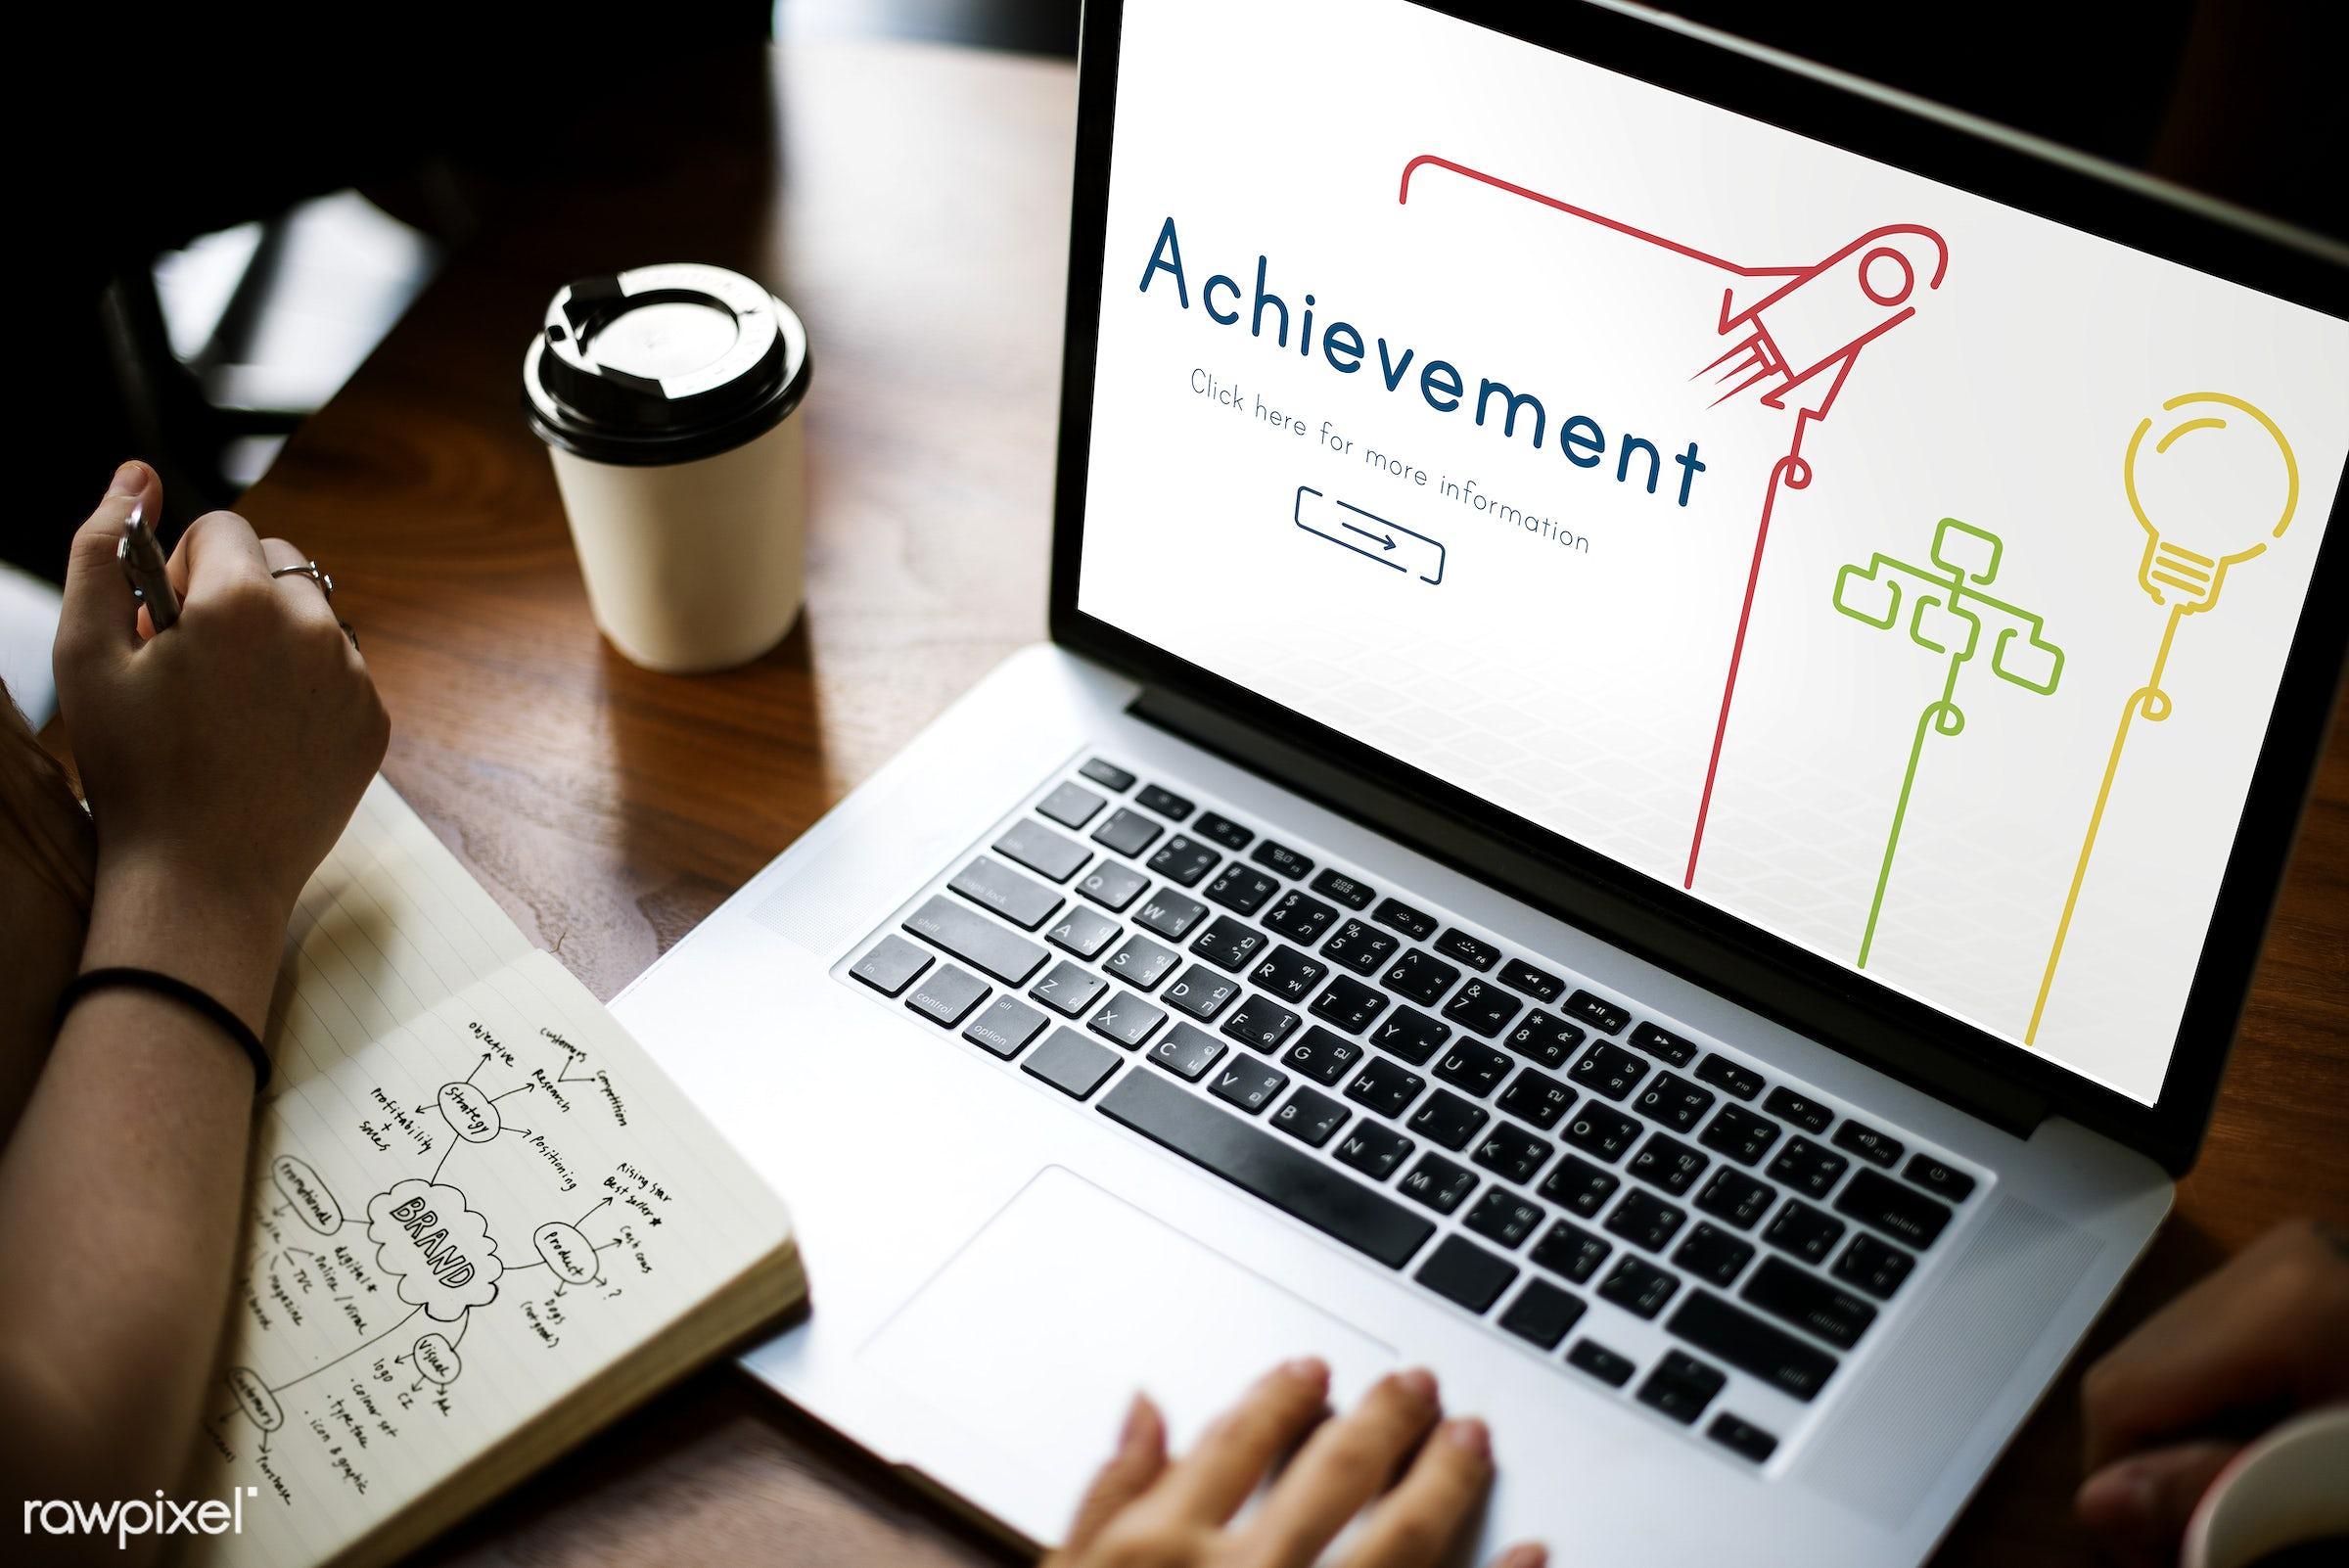 ability, accomplishment, achieve, achievement, browsing, coffee cup, development, device, digital, digital device,...